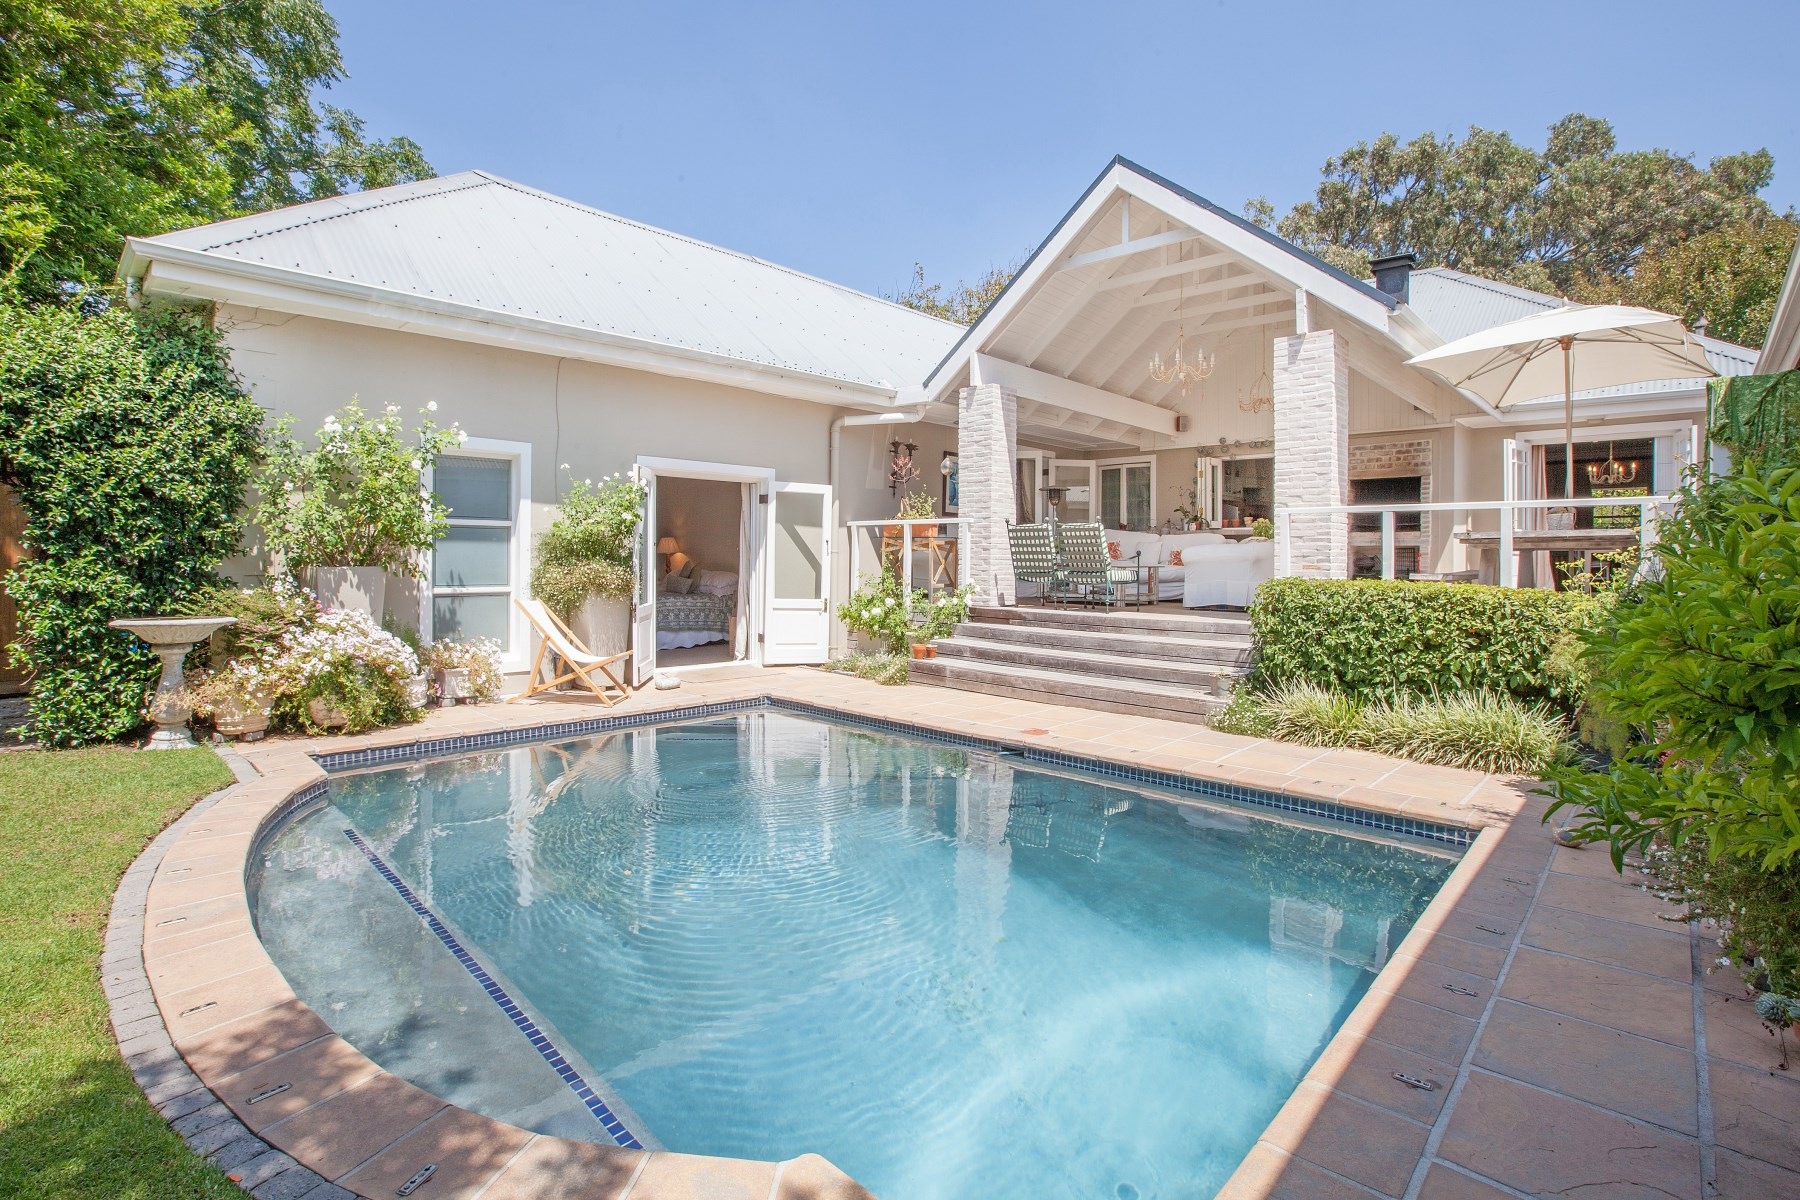 Casa Unifamiliar por un Venta en A PERFECT MARRIAGE OF HOME AND GARDEN Cape Town, Provincia Occidental Del Cabo, Sudáfrica